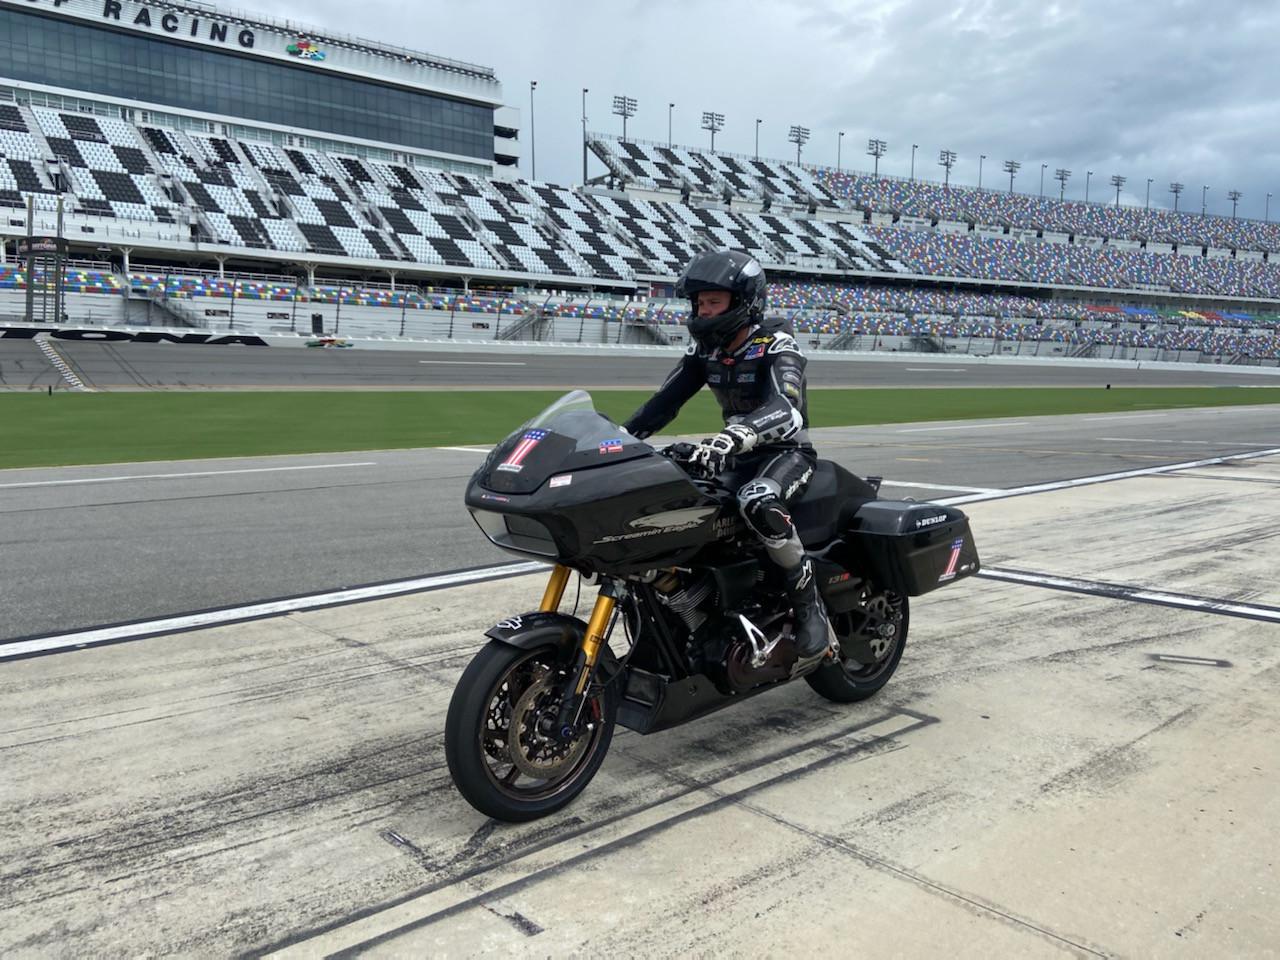 2021 MotoAmerica King Of The Baggers Champion Kyle Wyman heads out onto Daytona International Speedway Tuesday on his 165-horsepower, 630-pound Screamin' Eagle Harley-Davidson Road Glide racebike. Photo courtesy Kyle Wyman.